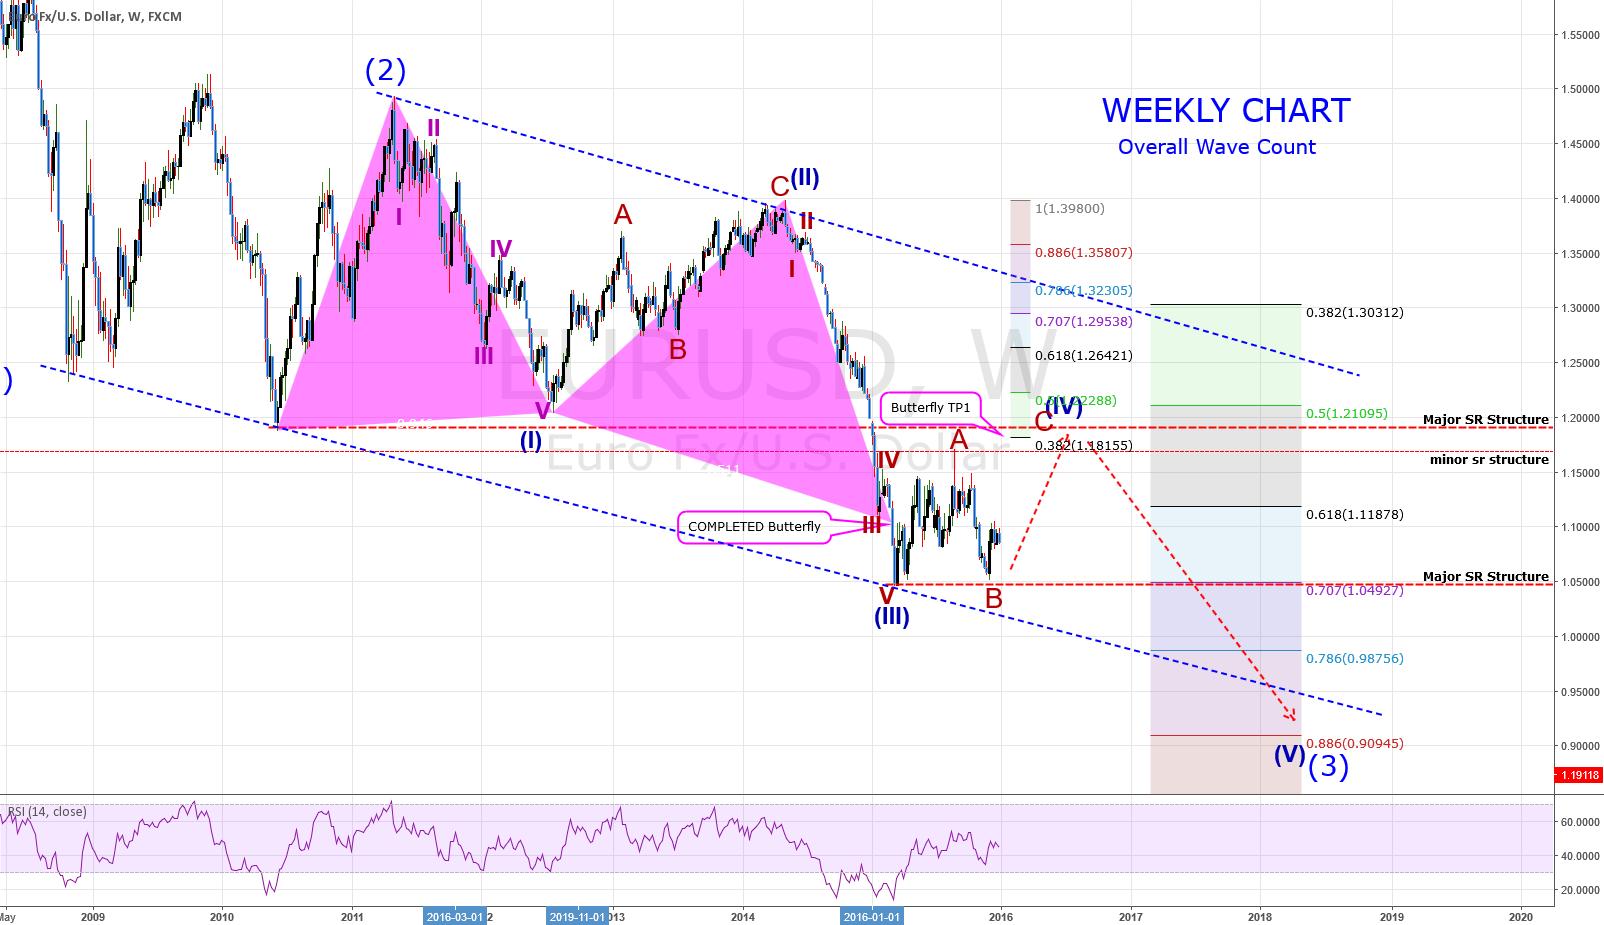 WEEKLY Chart: EURUSD: Overall Wave Count Scenario